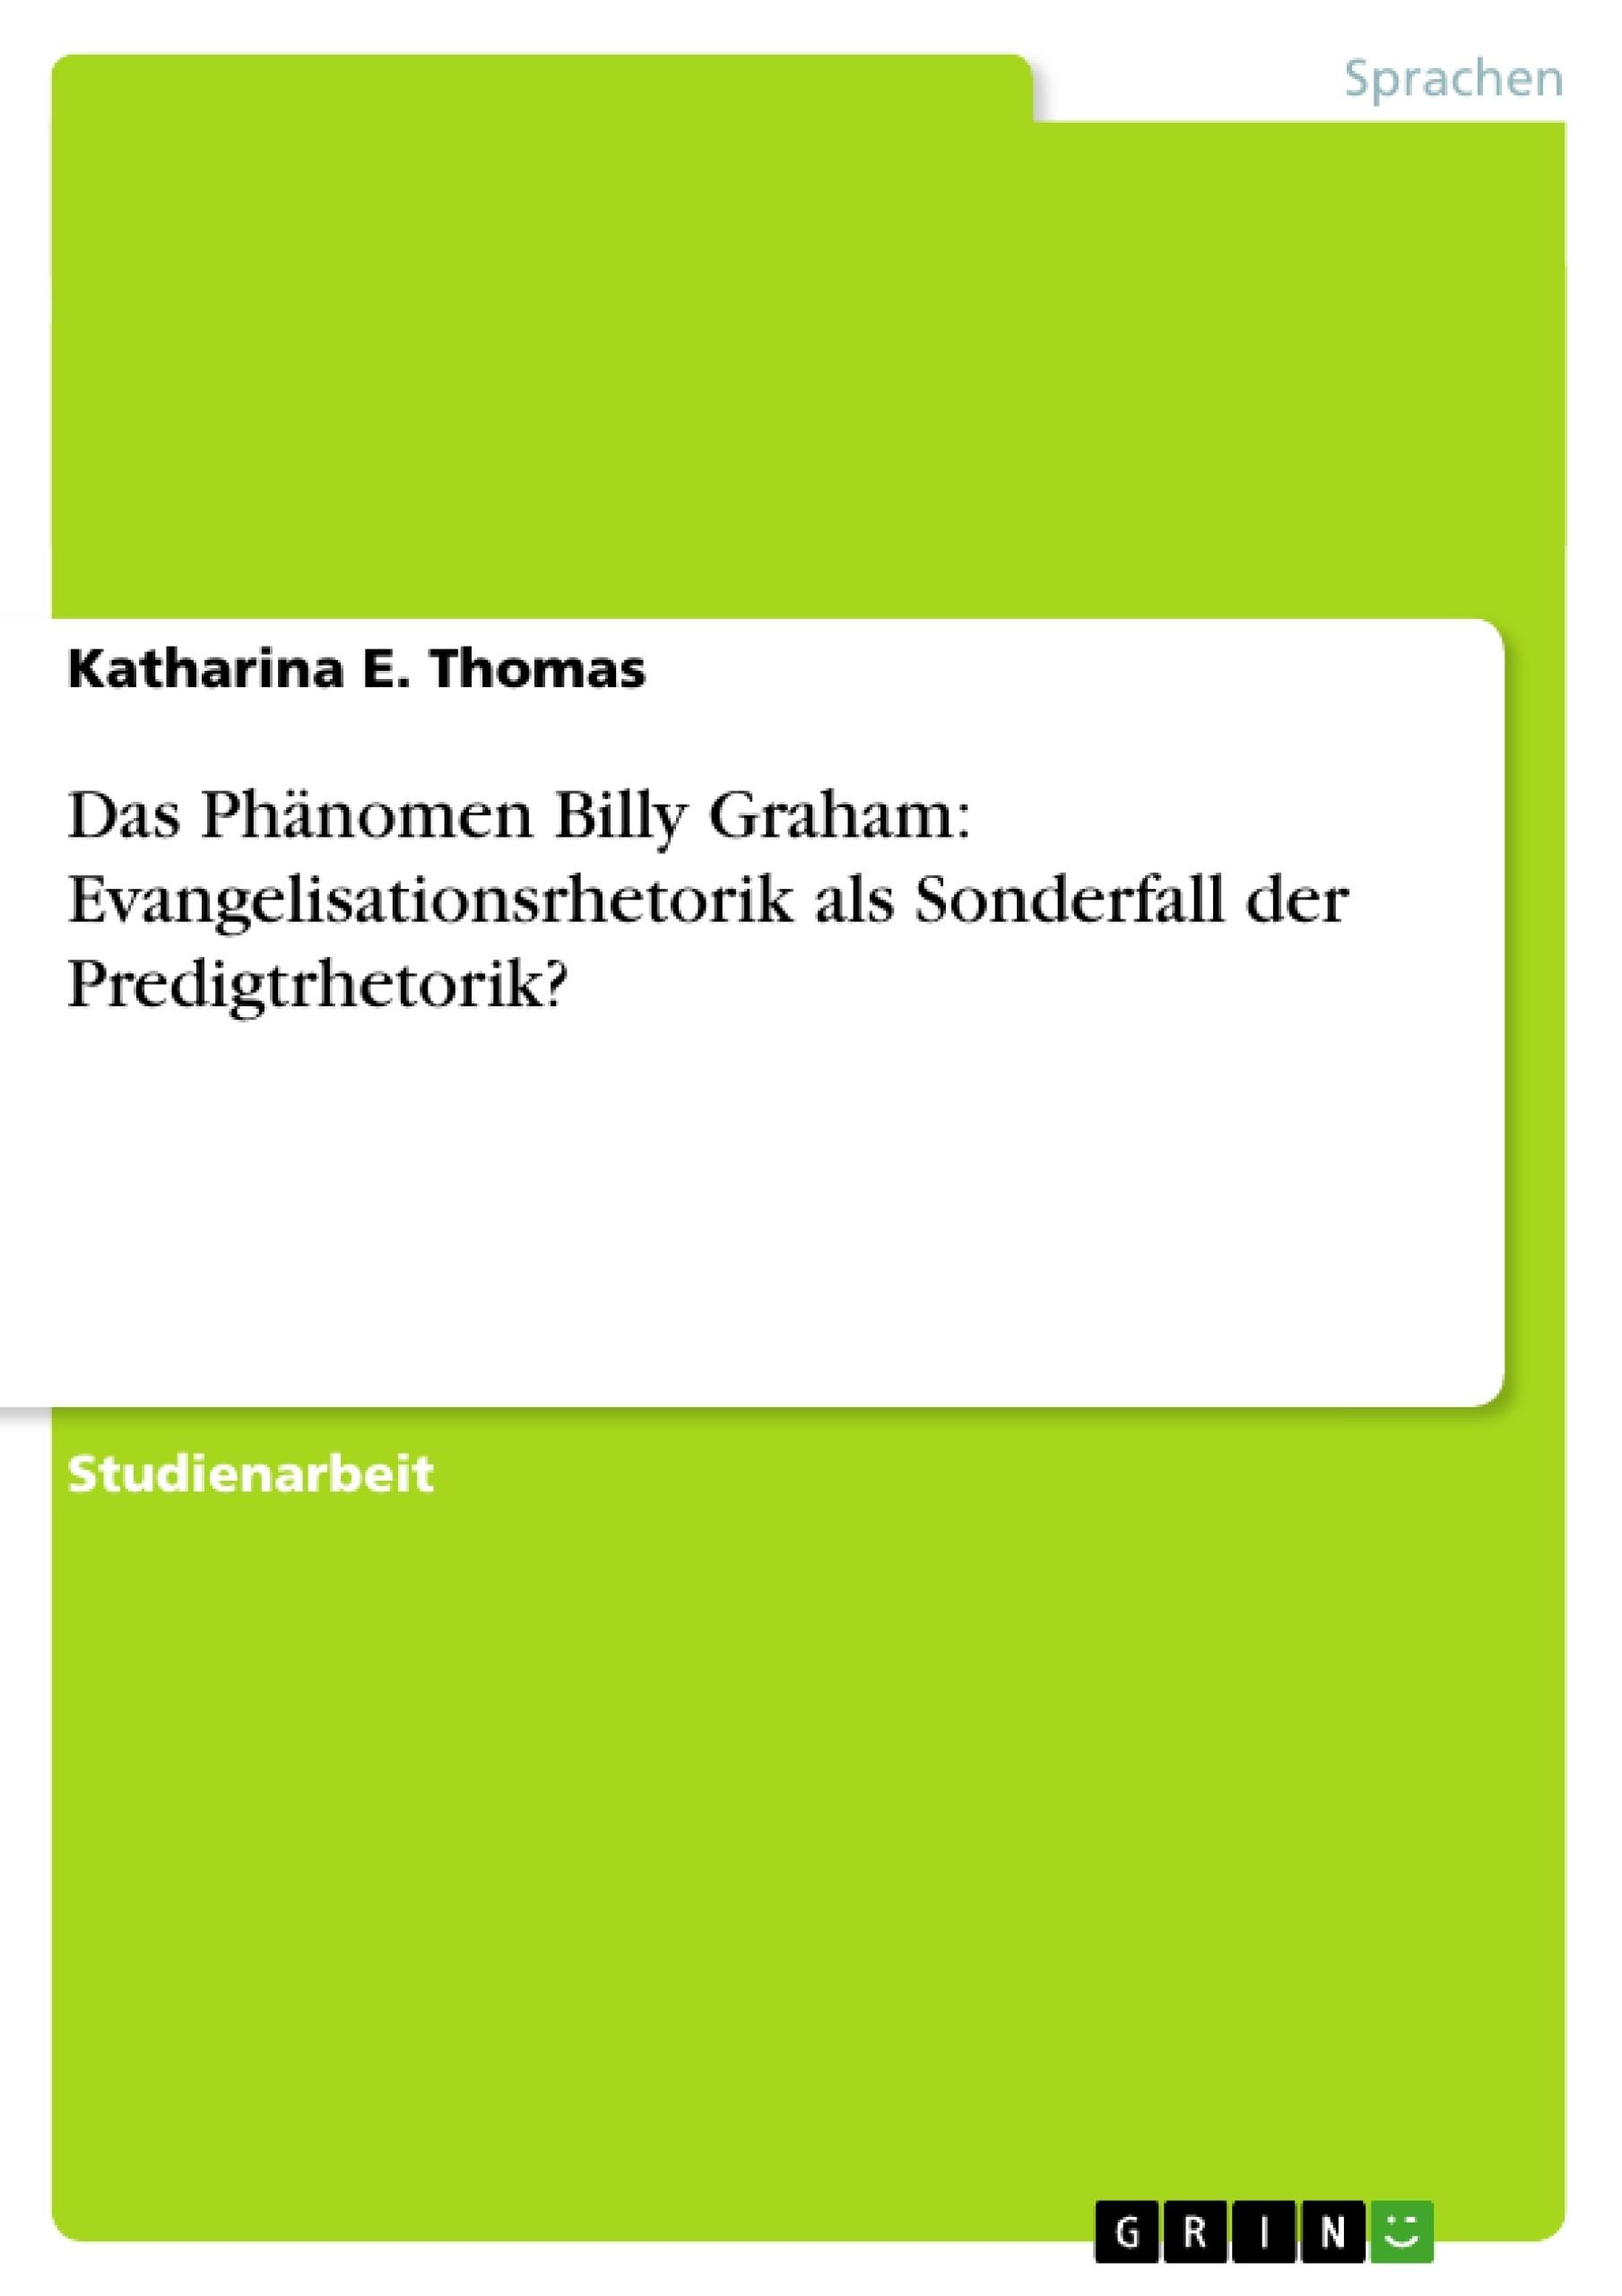 Titel: Das Phänomen Billy Graham: Evangelisationsrhetorik als Sonderfall der Predigtrhetorik?